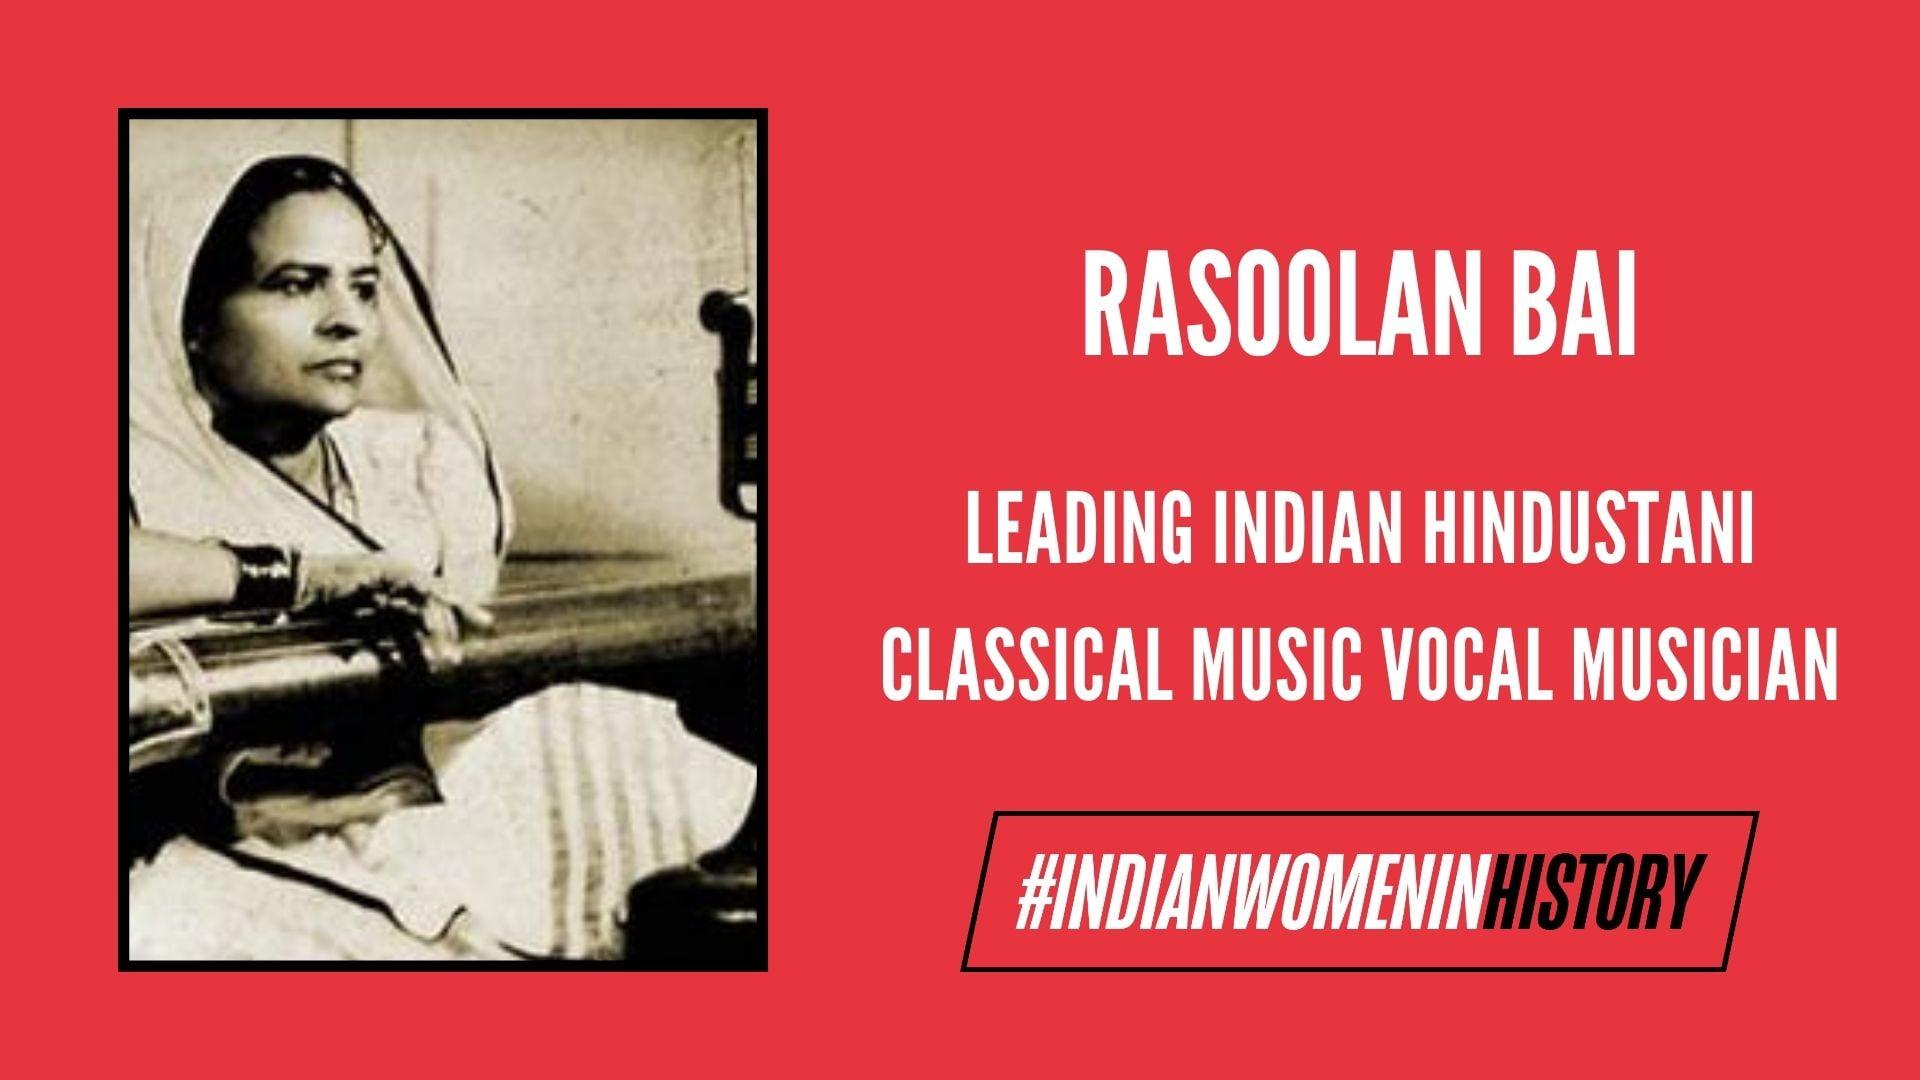 Rasoolan Bai